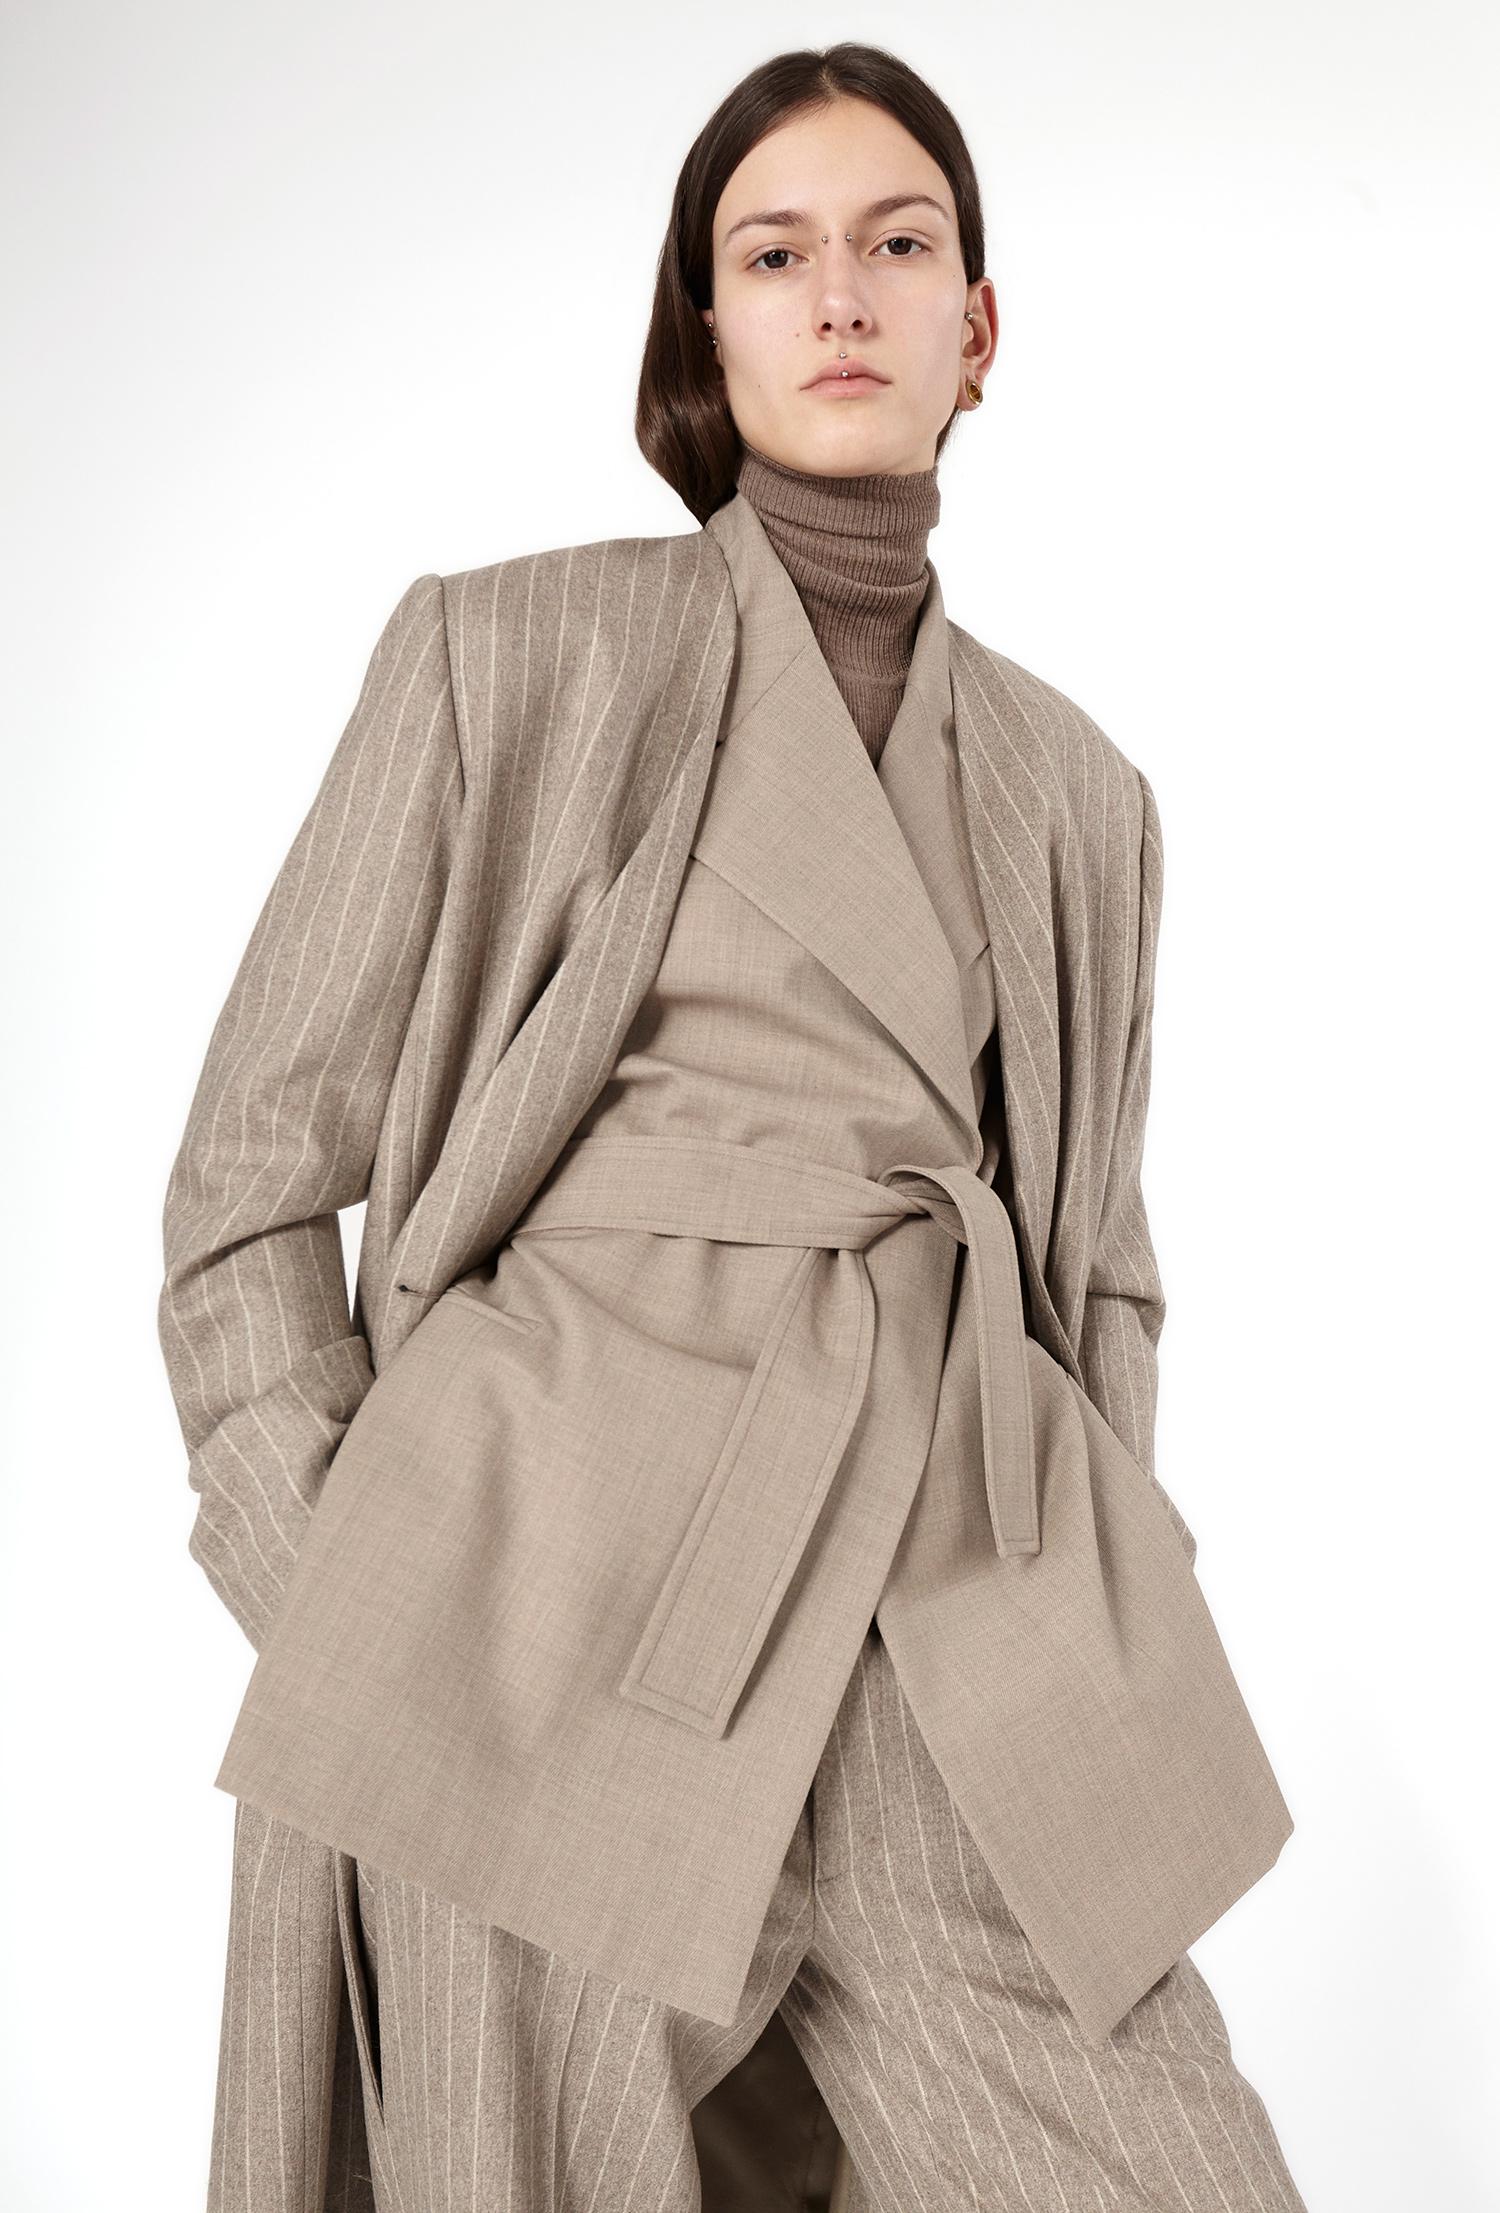 Jacket ROMA Coat RENEE Trousers ROMINA Knitwear REMICIA